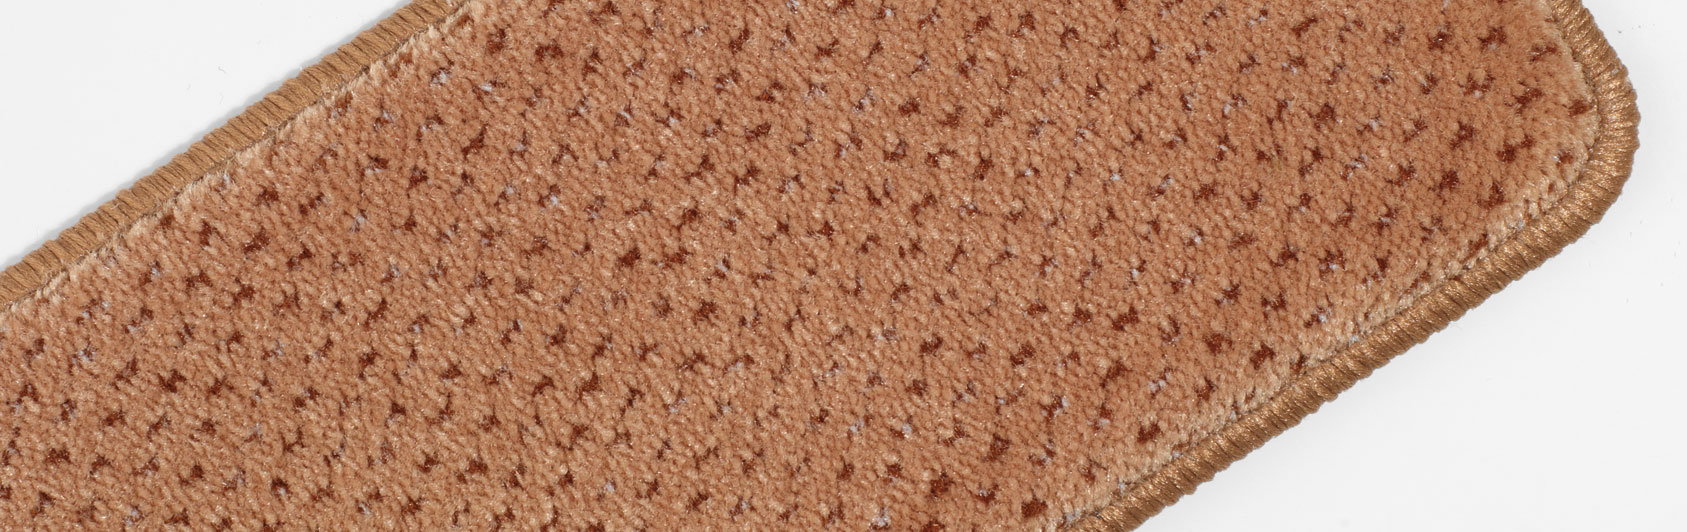 sample hassock crushed velvet color code 2226 color dark beige